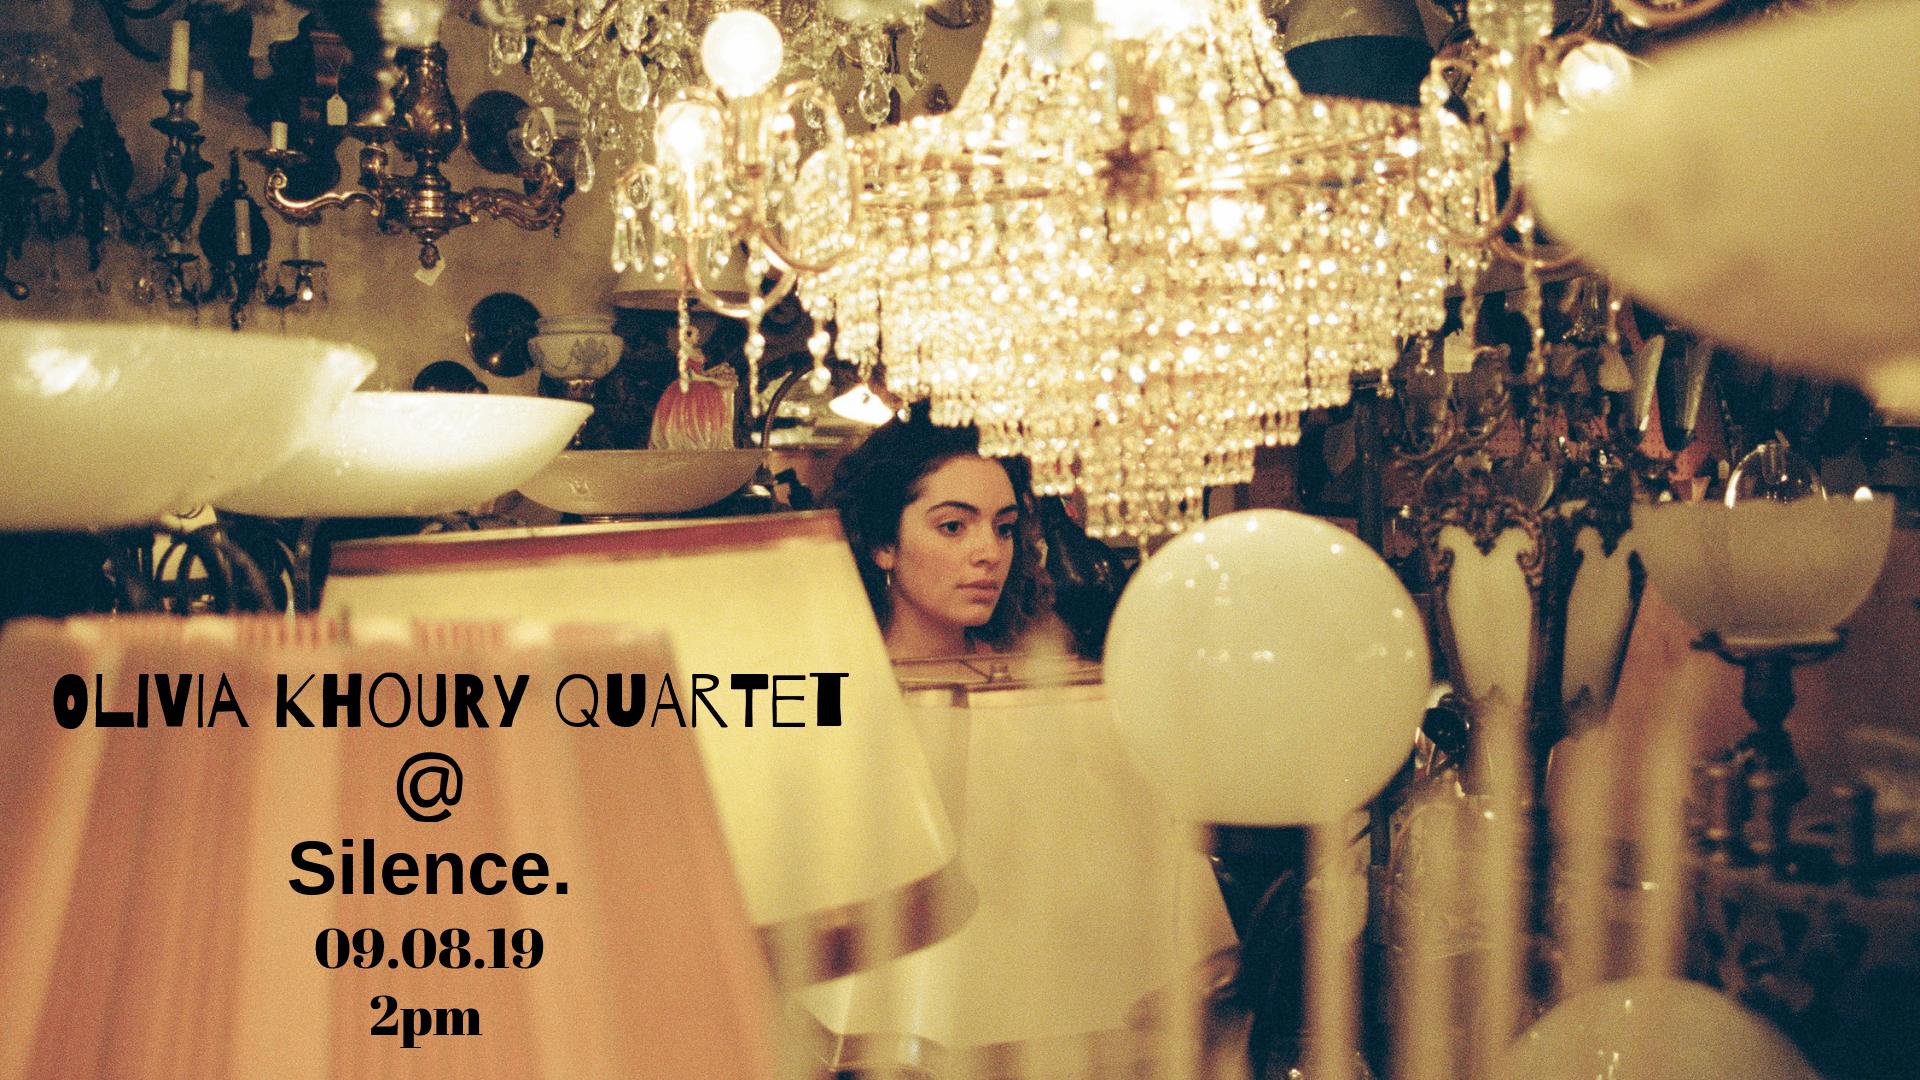 Olivia Khoury Quartet